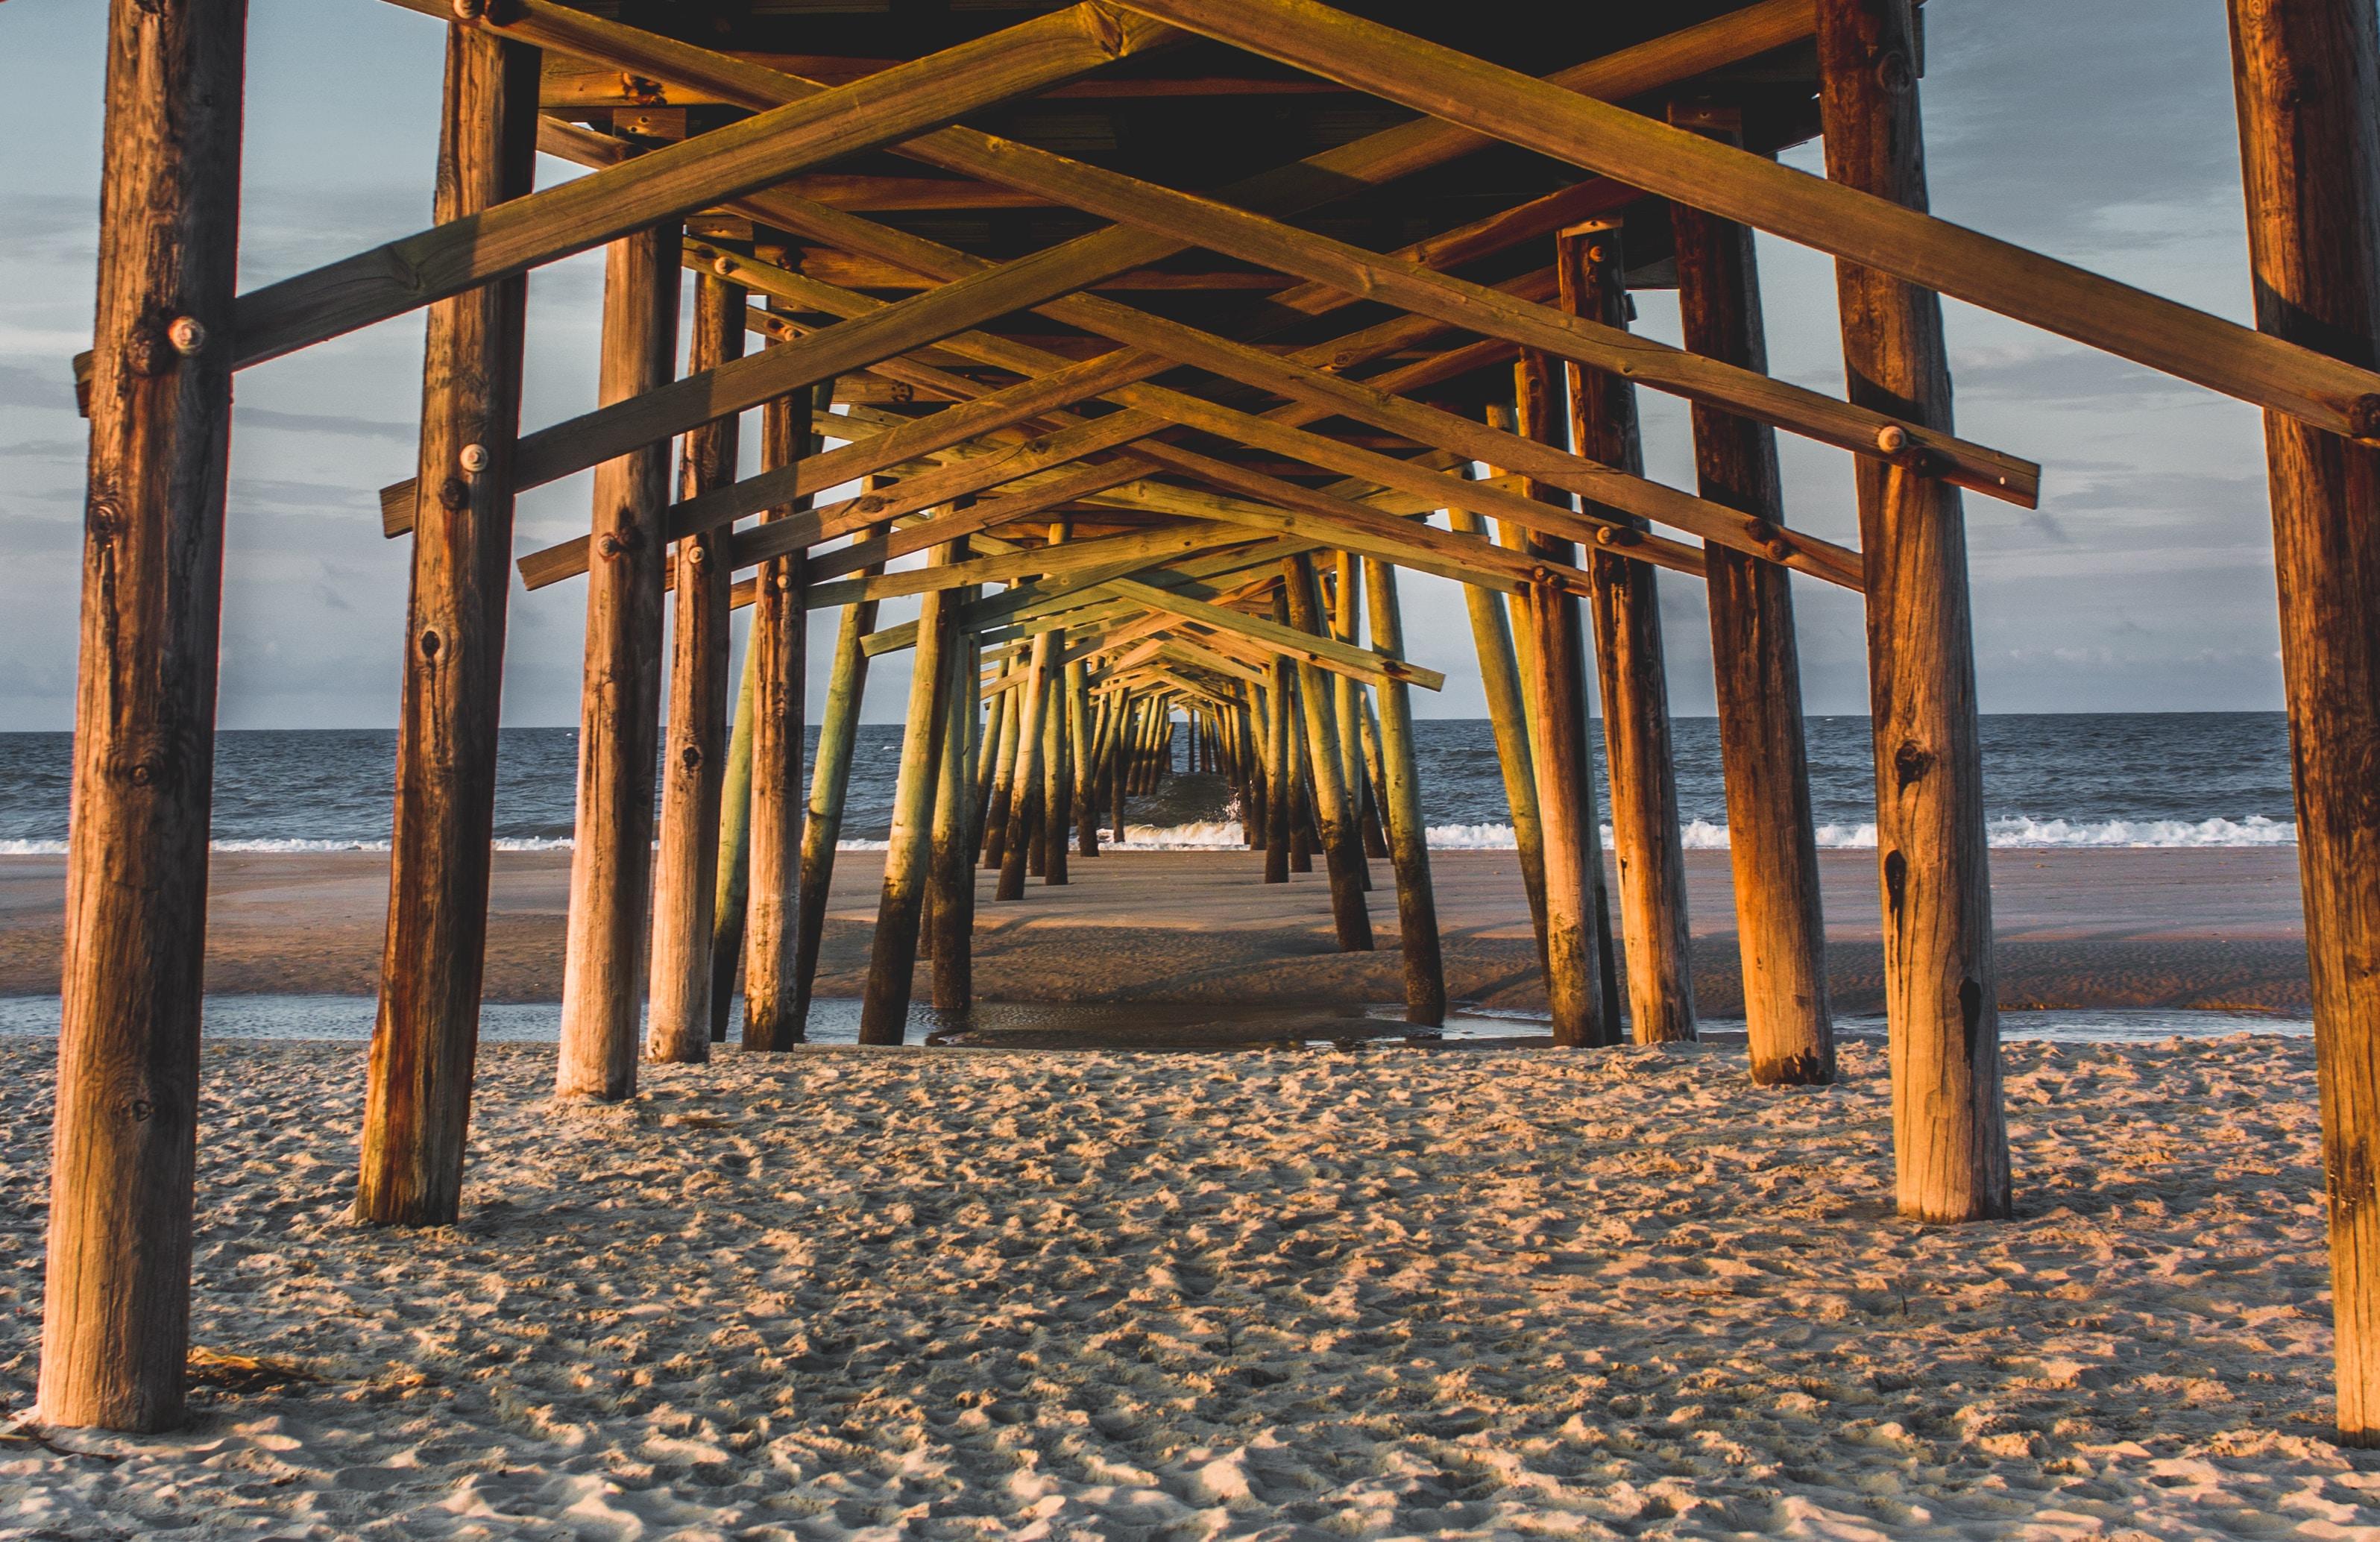 brown wooden walkway above gray sand